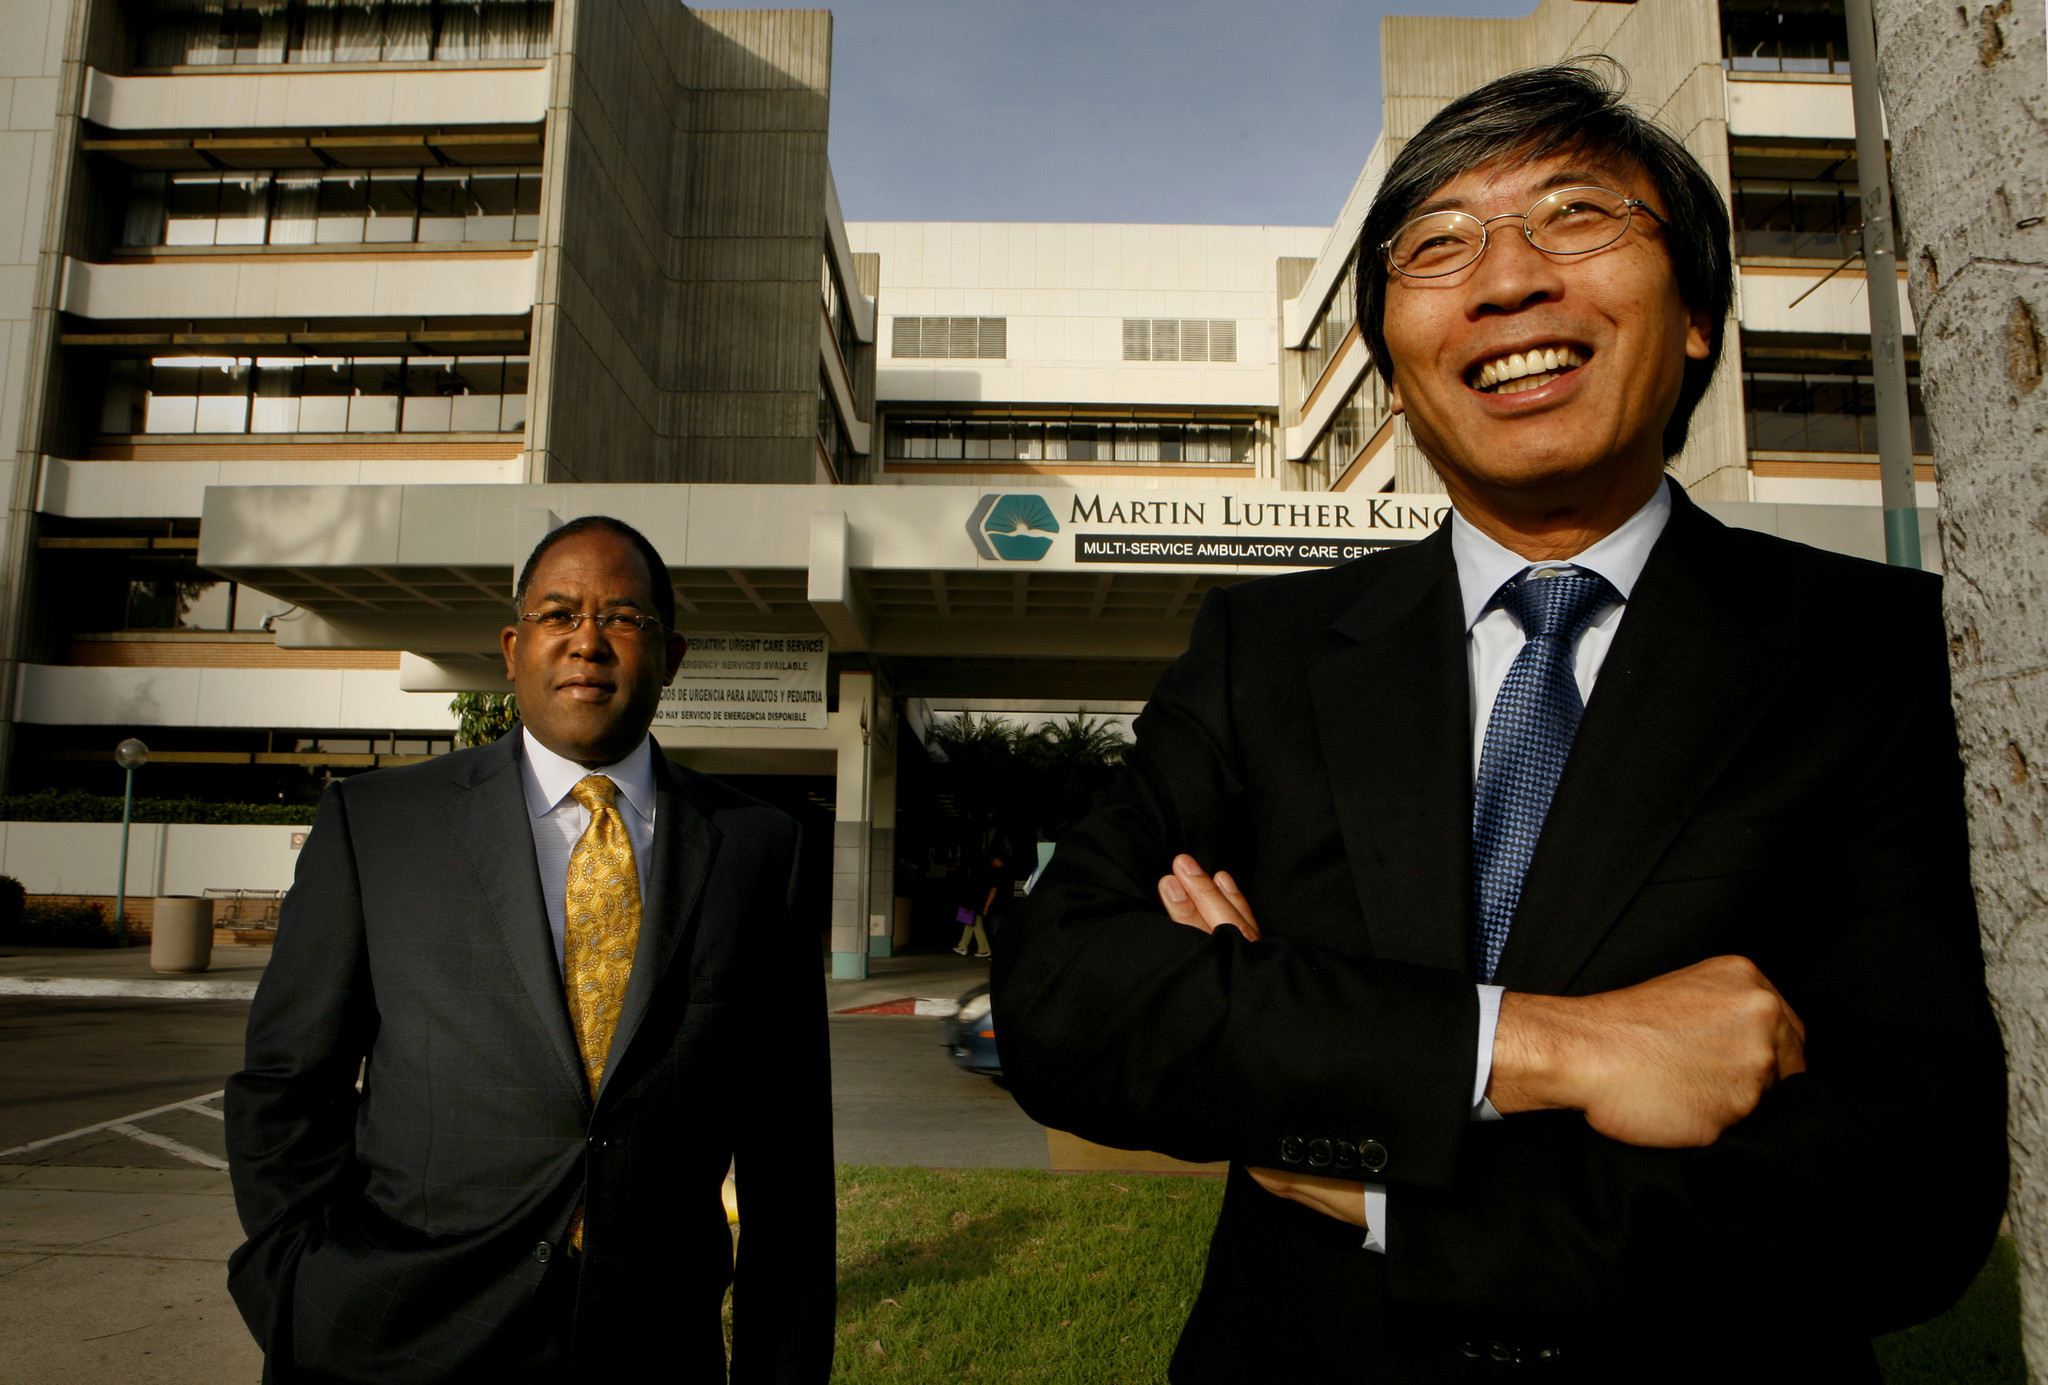 El supervisor Mark Ridley-Thomas y el Dr. Patrick Soon-Shiong